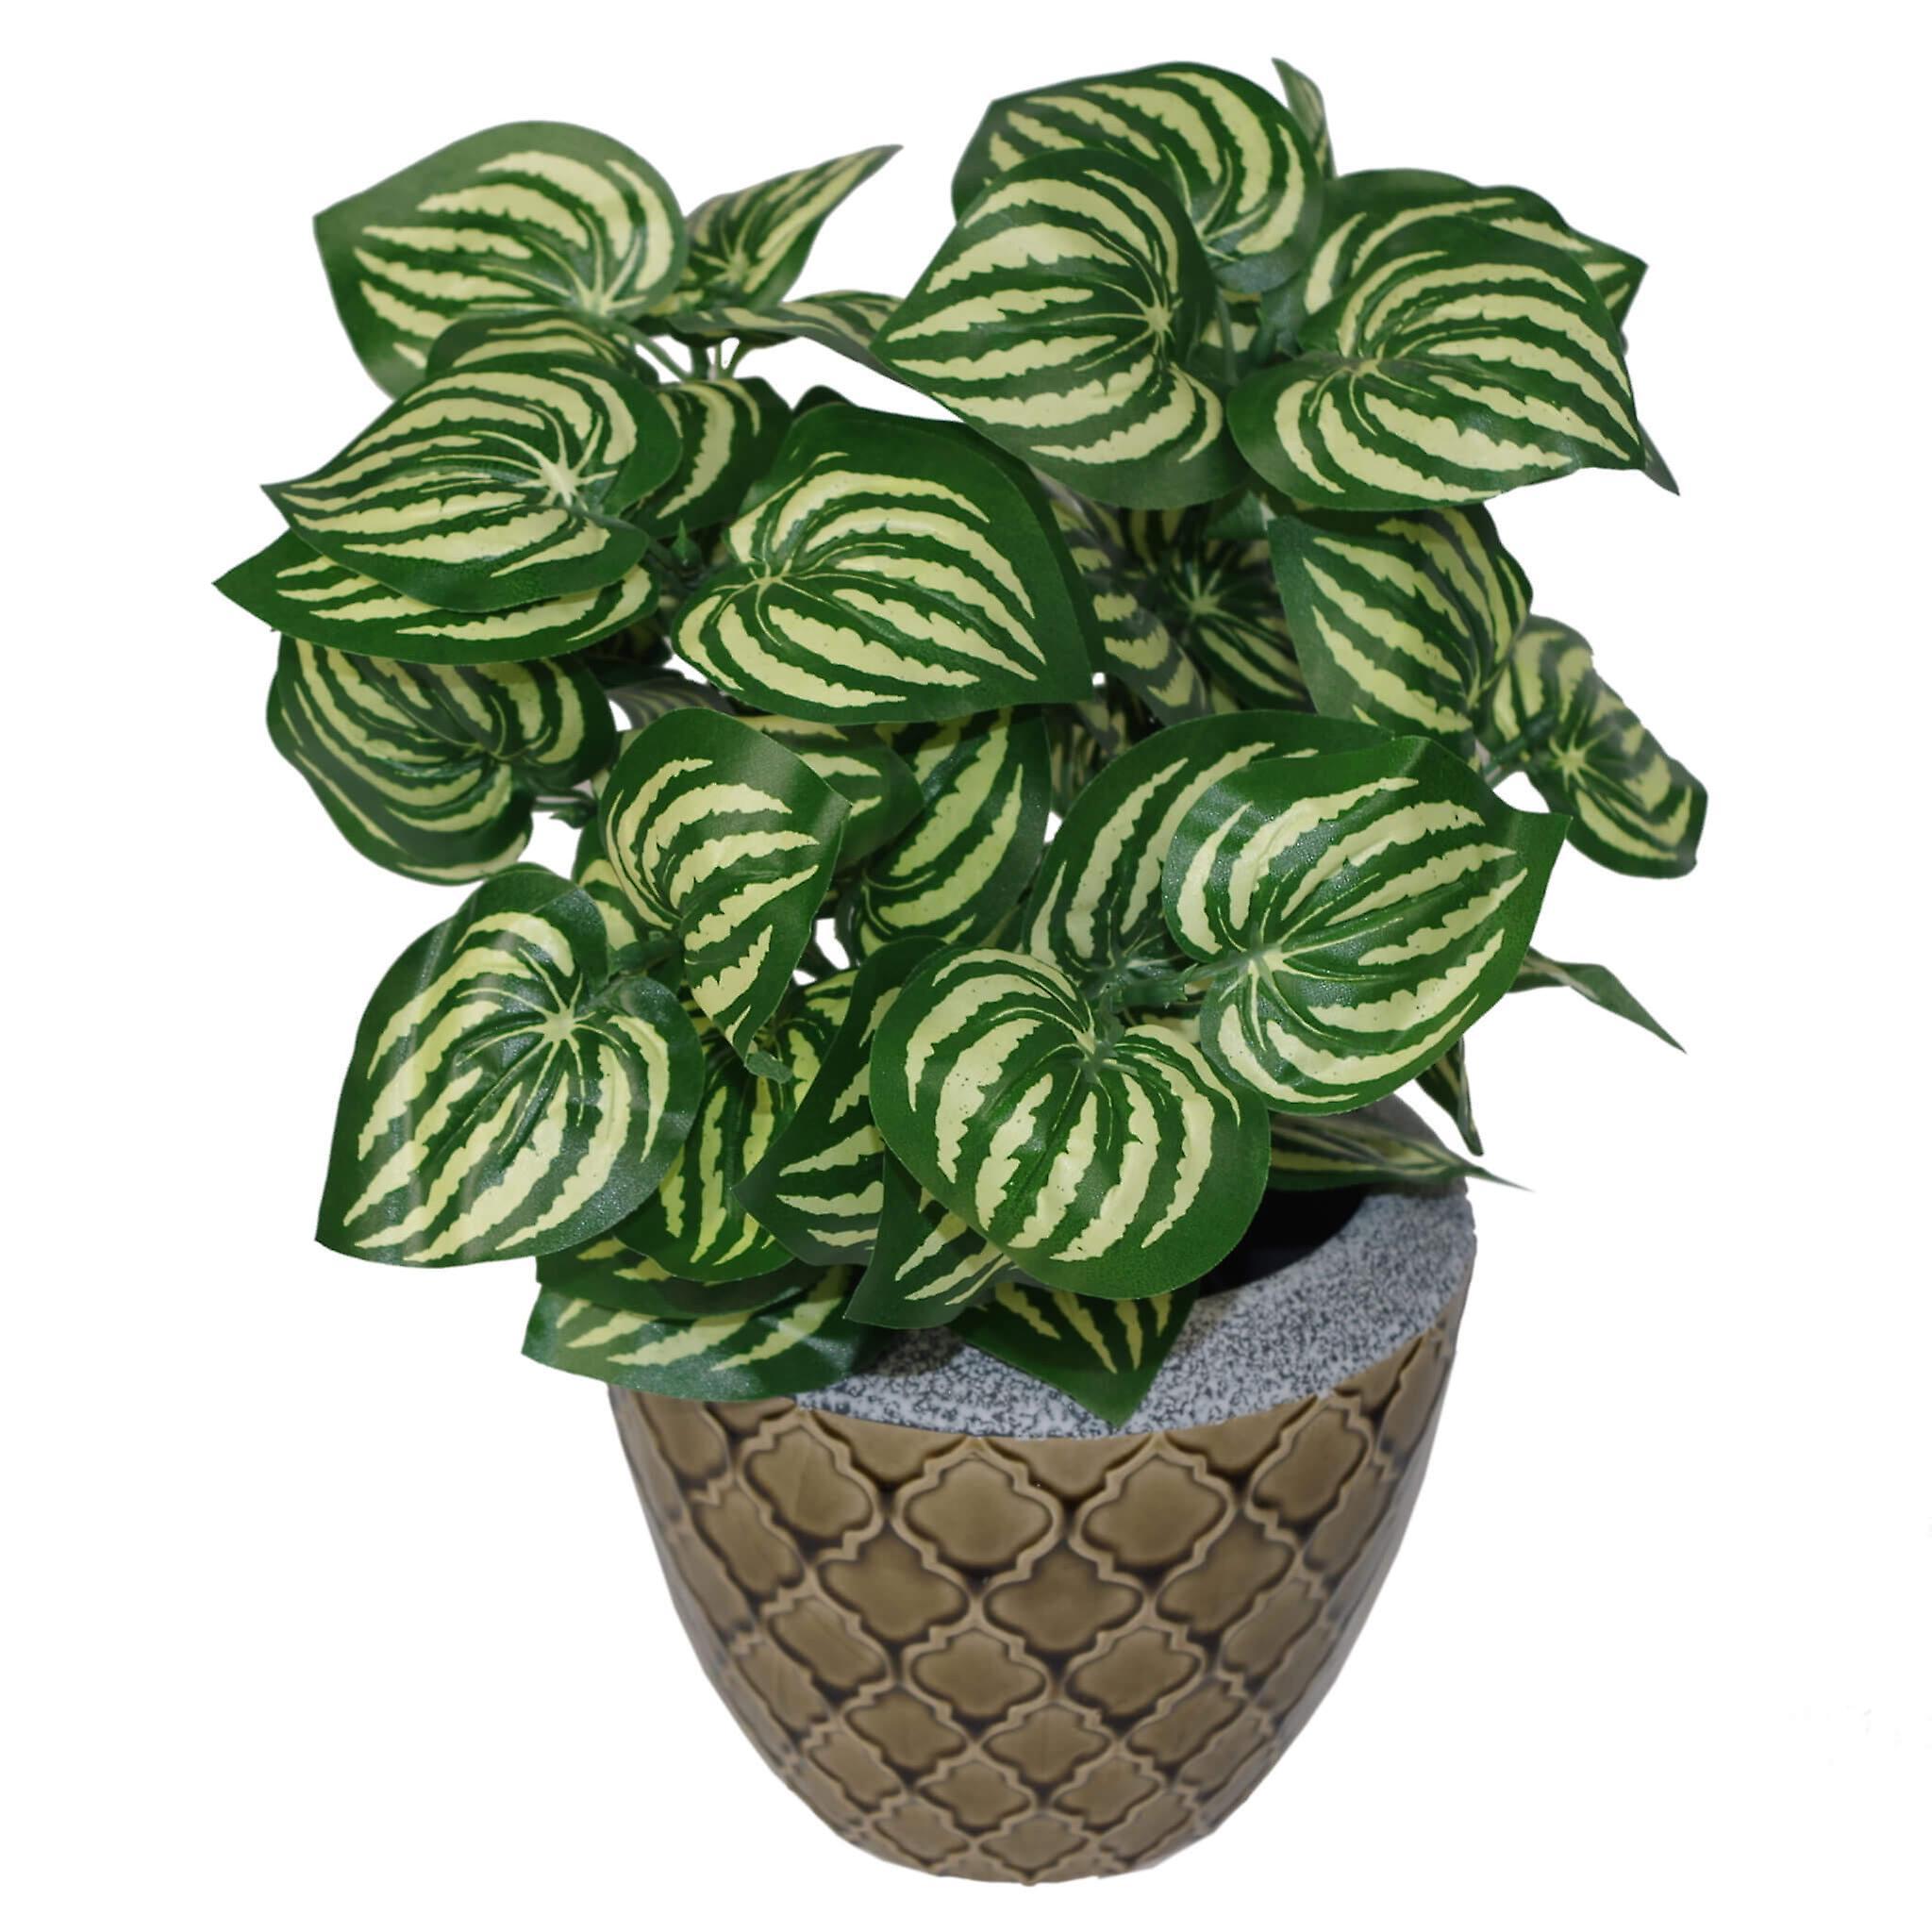 45cm Artificial Watermelon Style Leaves Plant